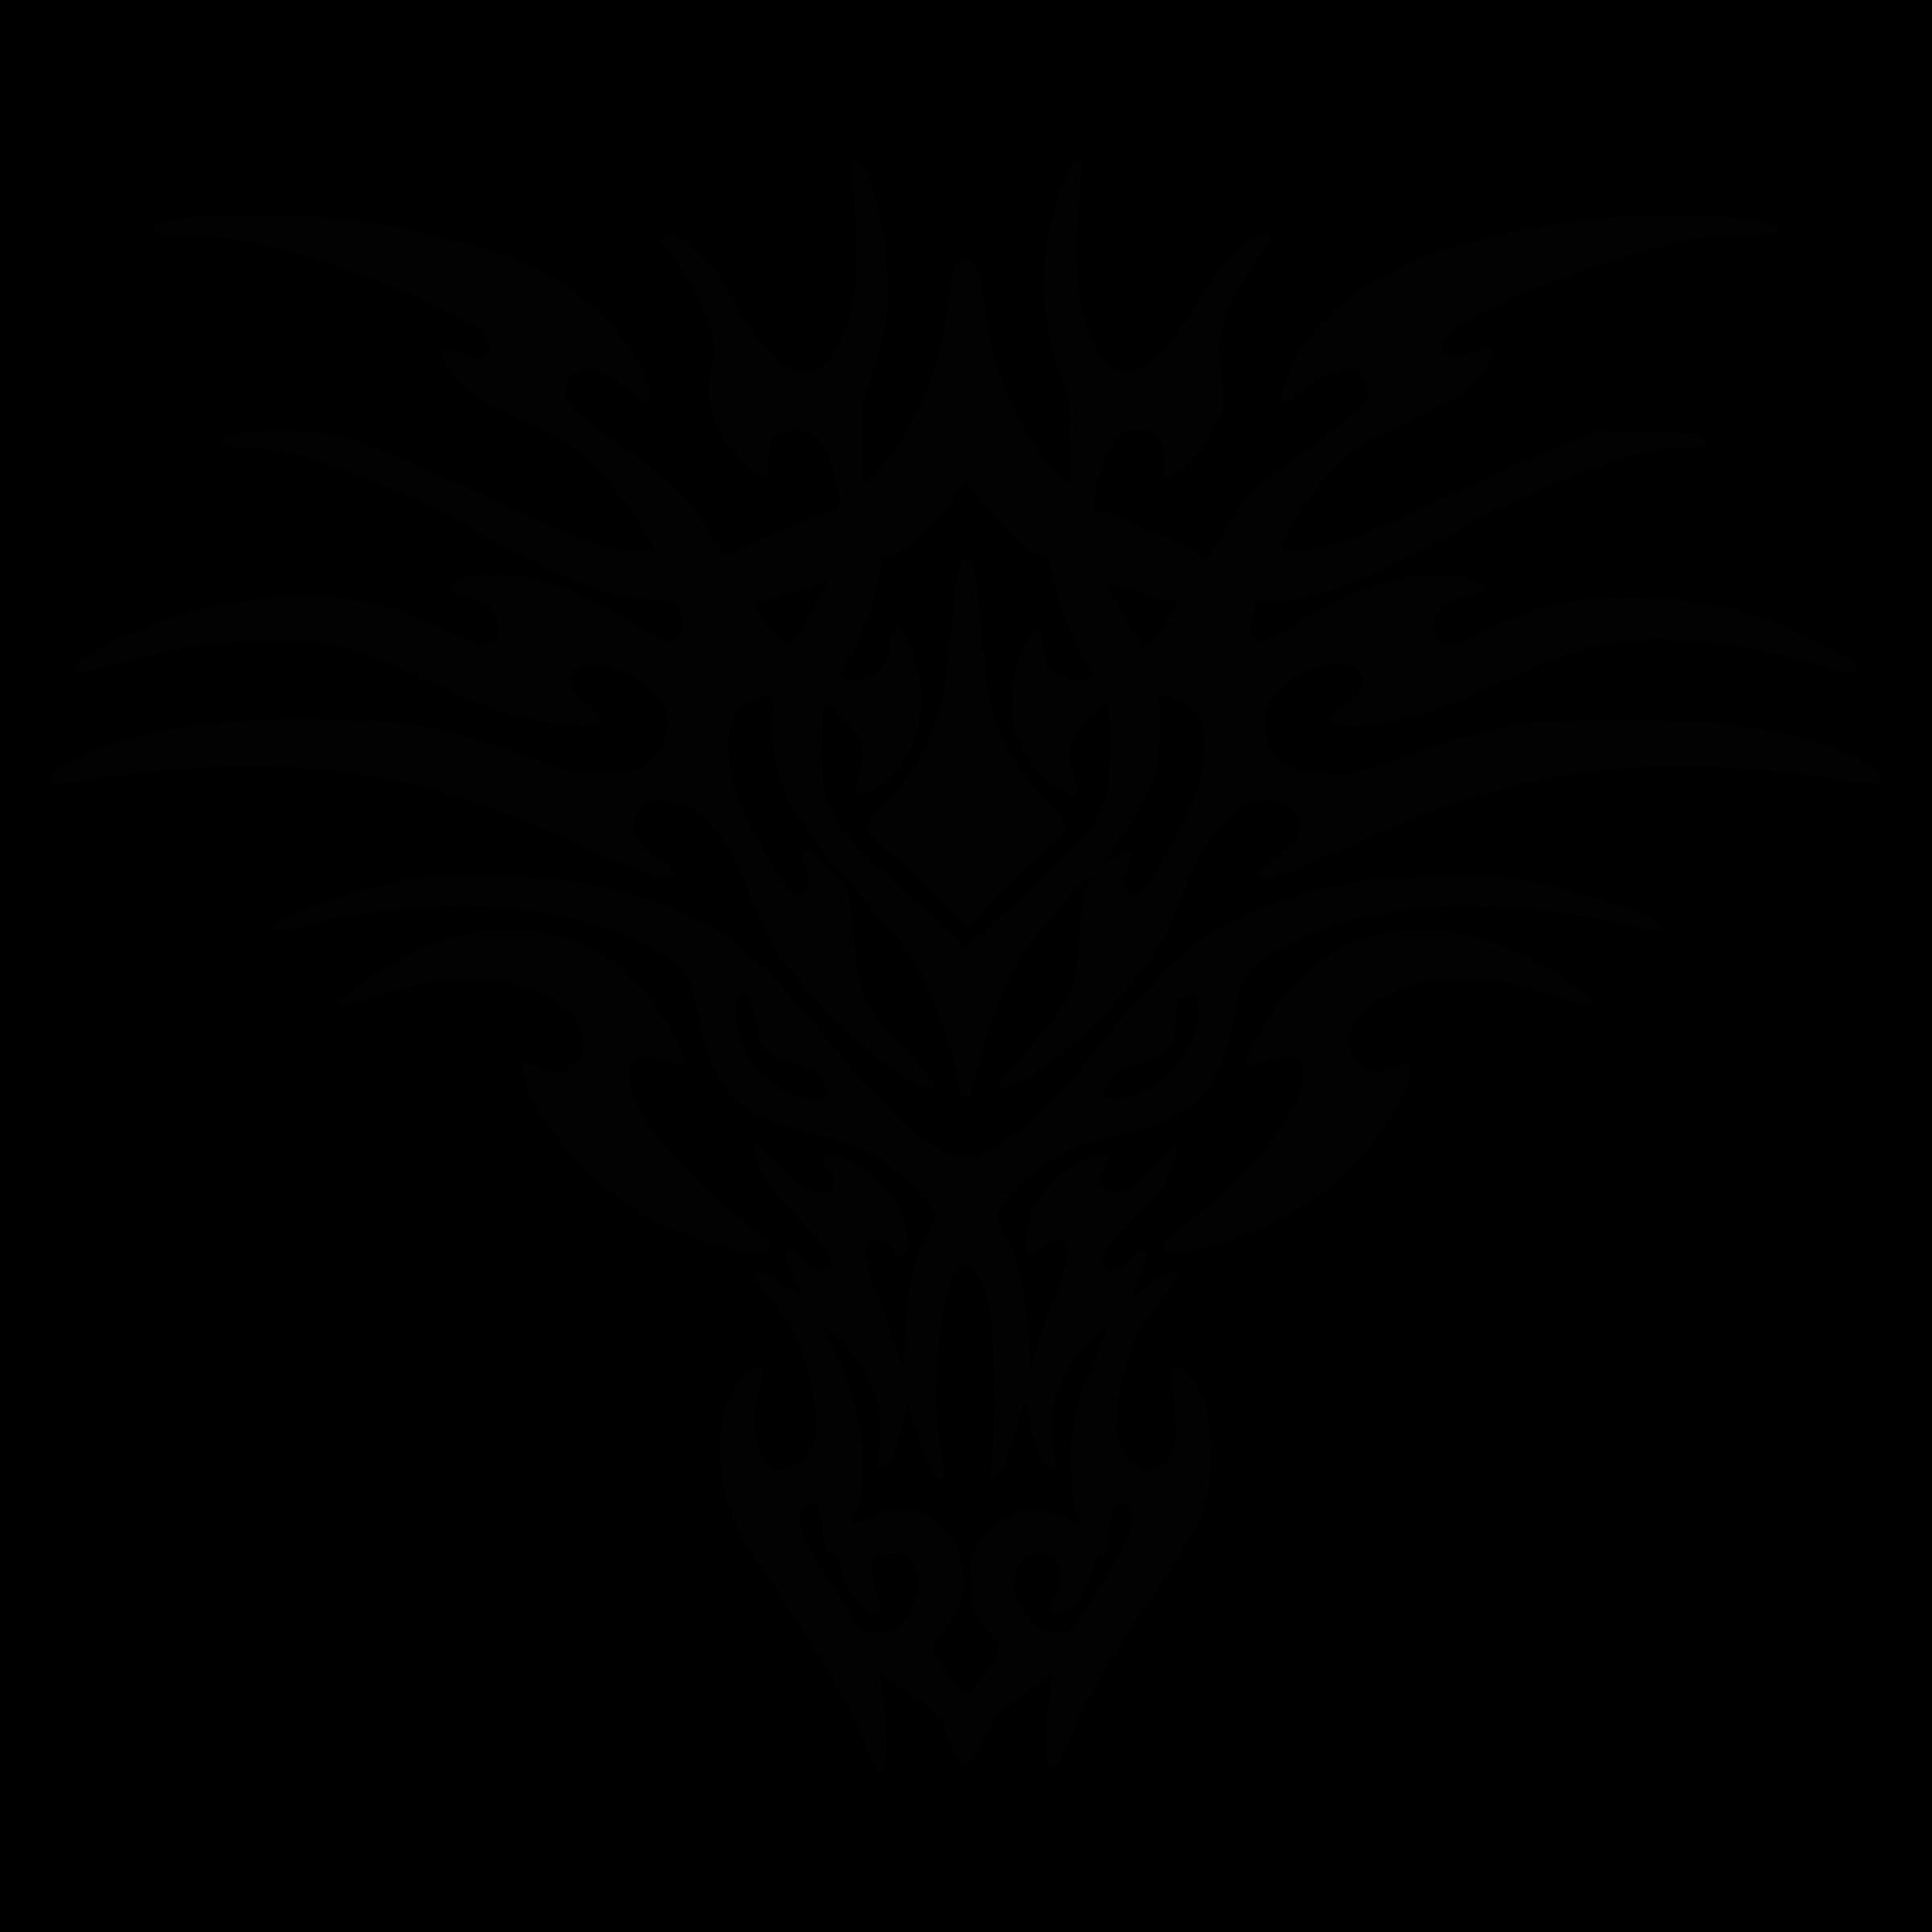 Clipart dragon dragon head. Clipartblack com animal free